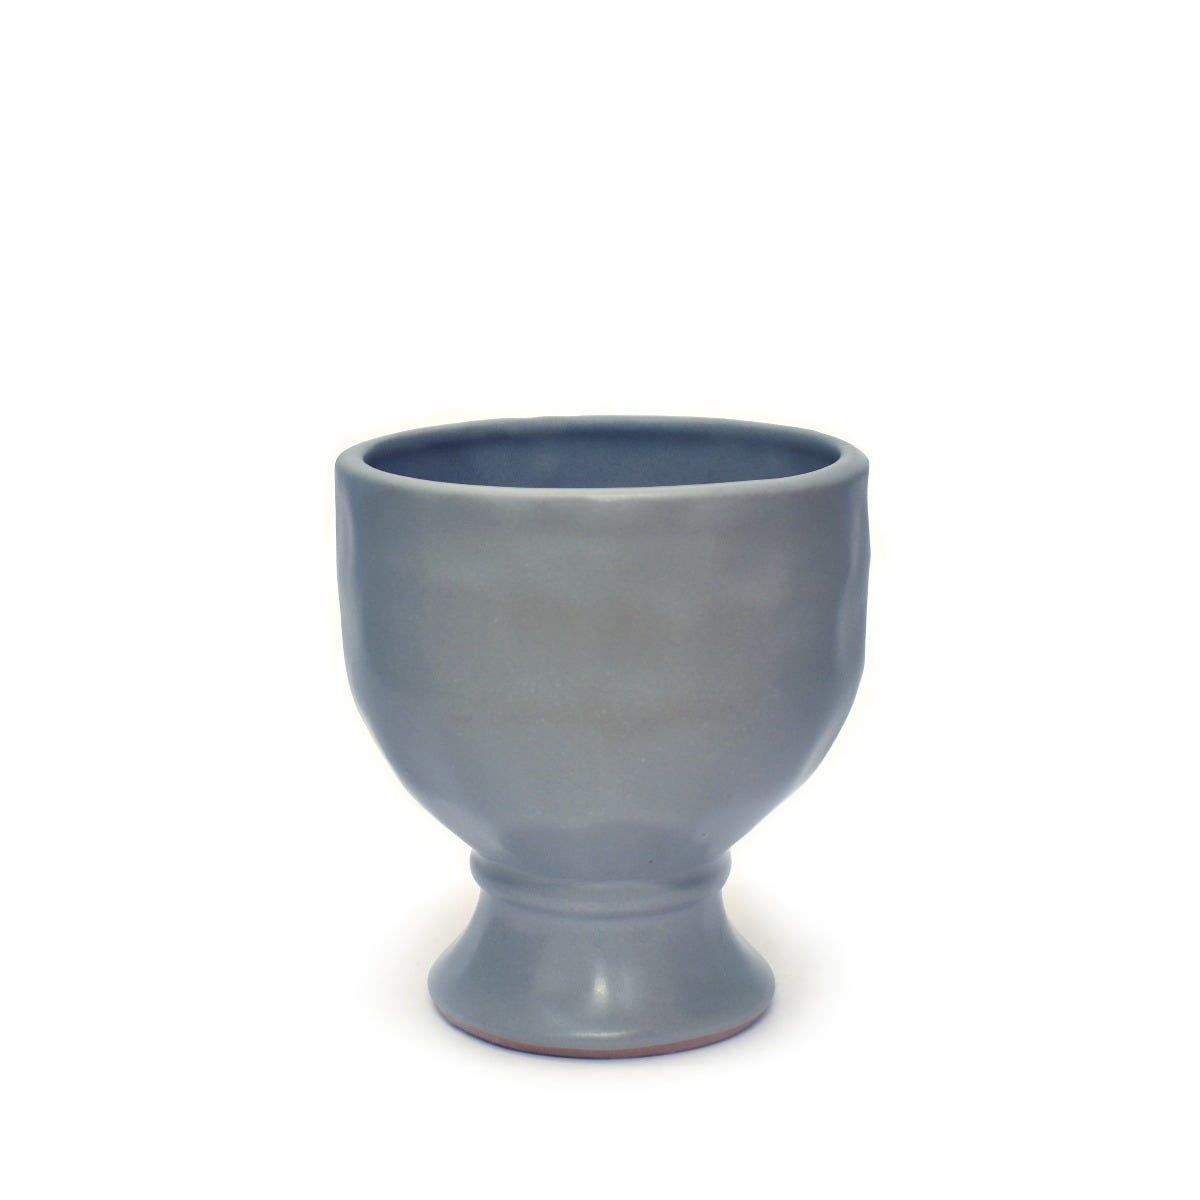 Maceta de pasta de barro copa prisma artesanal